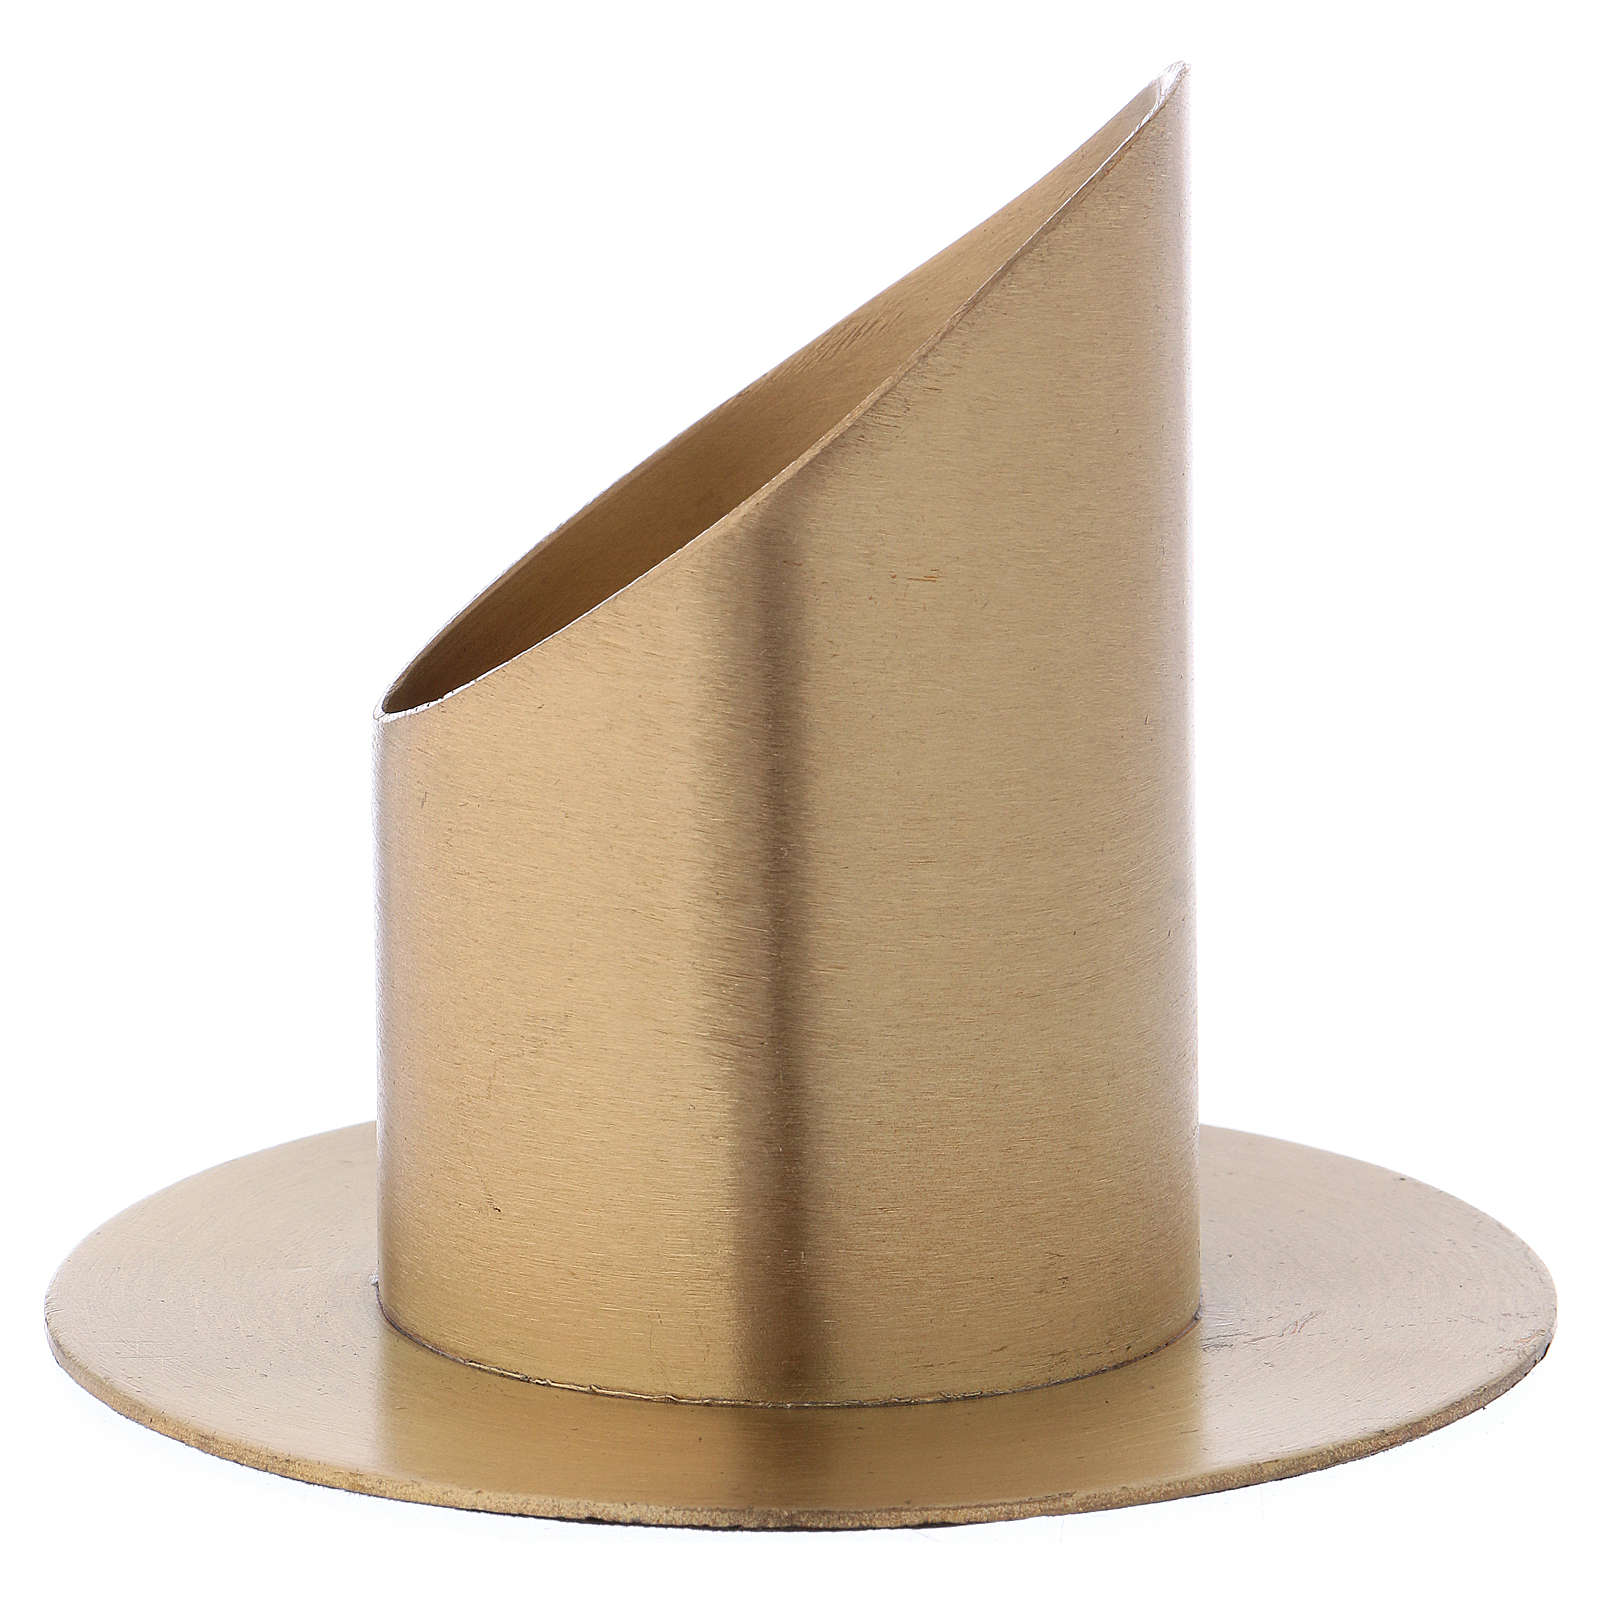 Portacandele forma cilindrica ottone dorato opaco per candela 5 cm 4